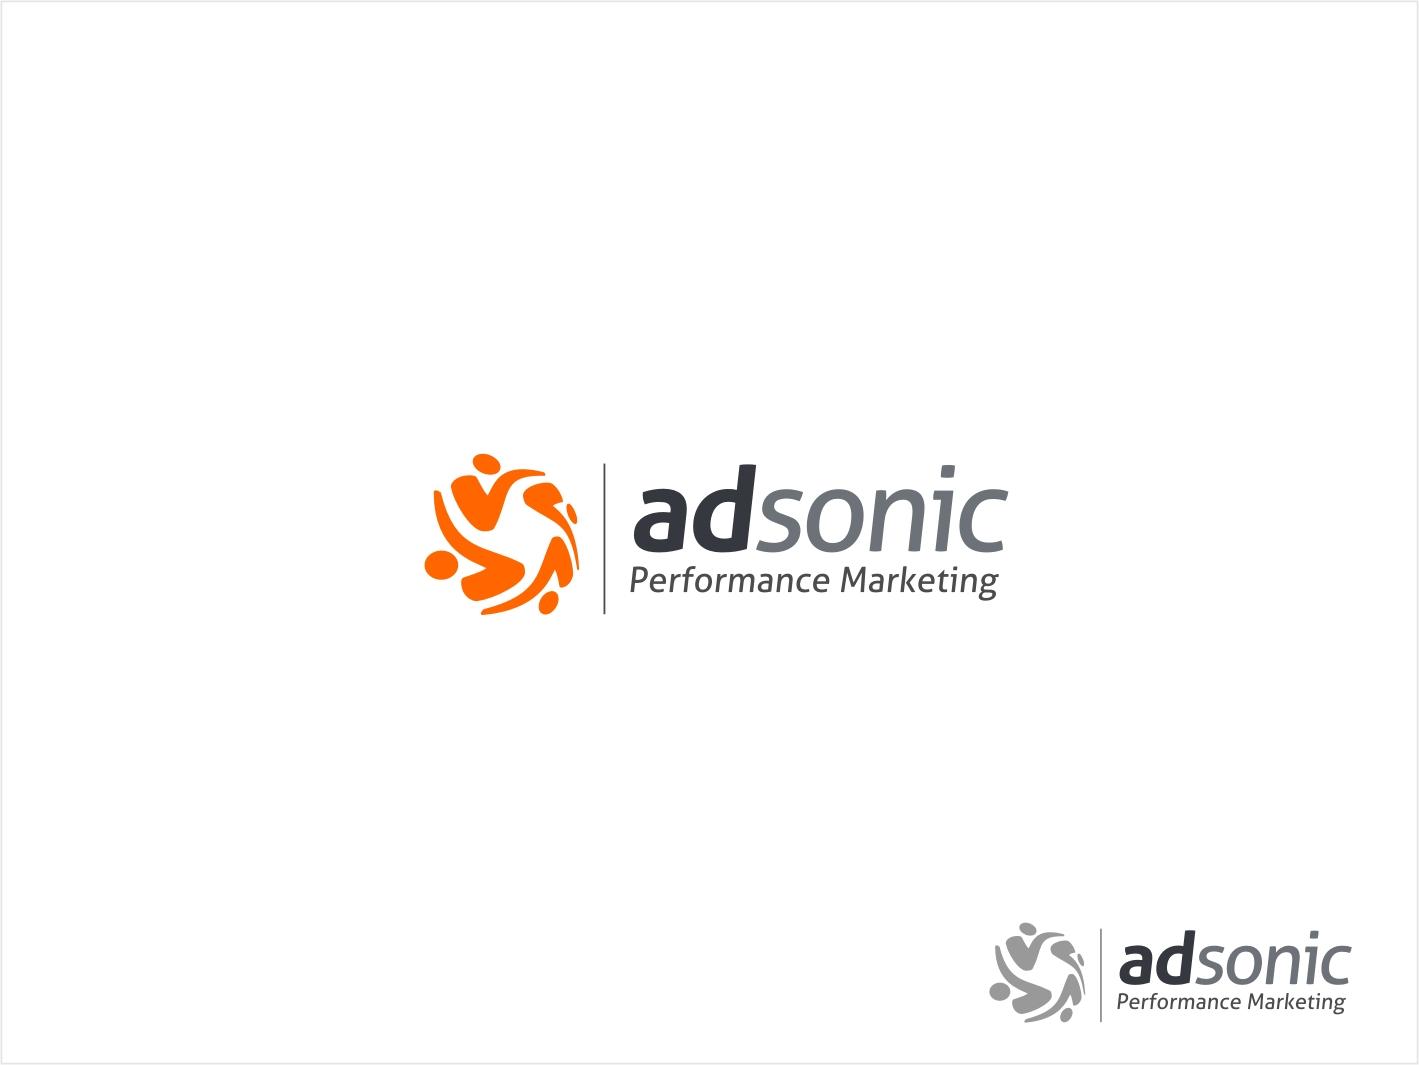 design #44 of mldesign